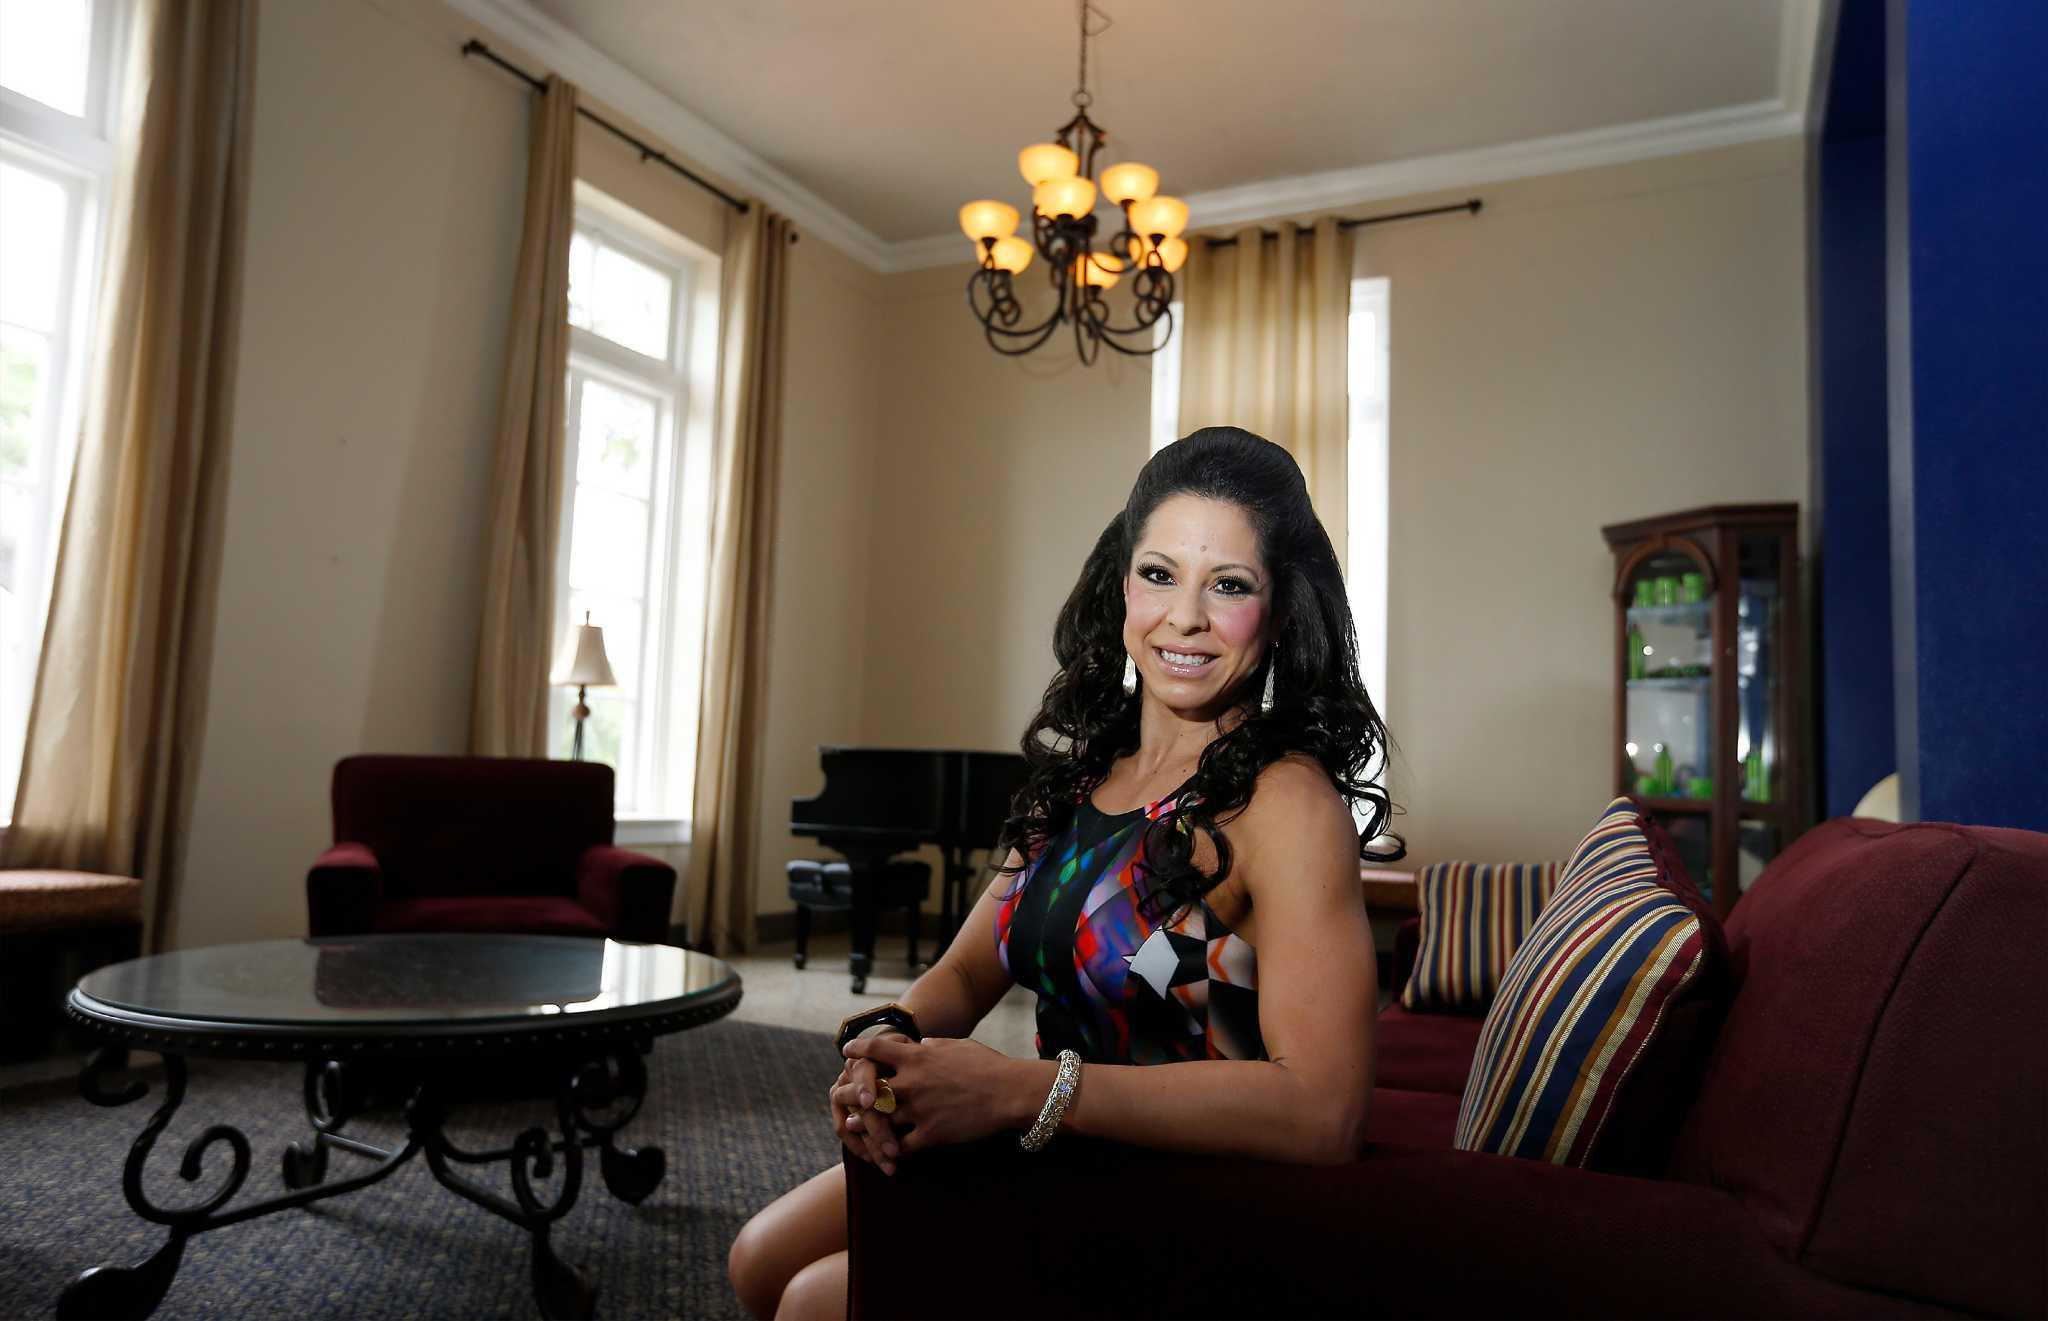 Sandra Treviño bakes and takes photos for The Playhouse San Antonio